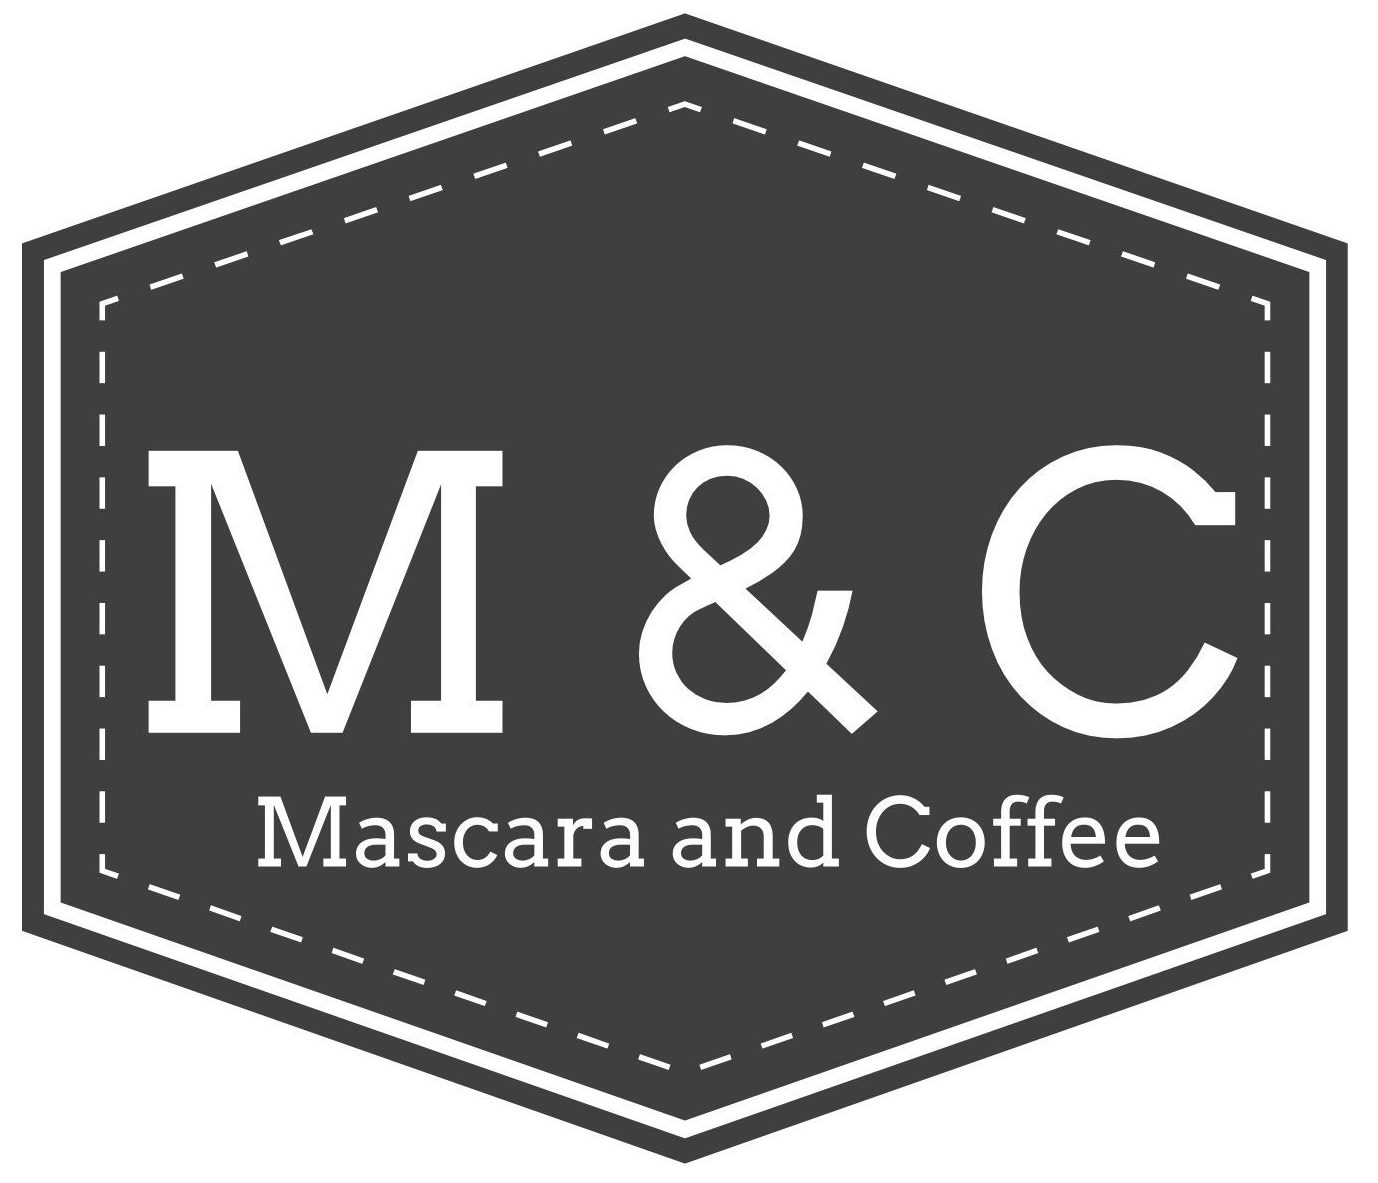 Mascara and Coffee